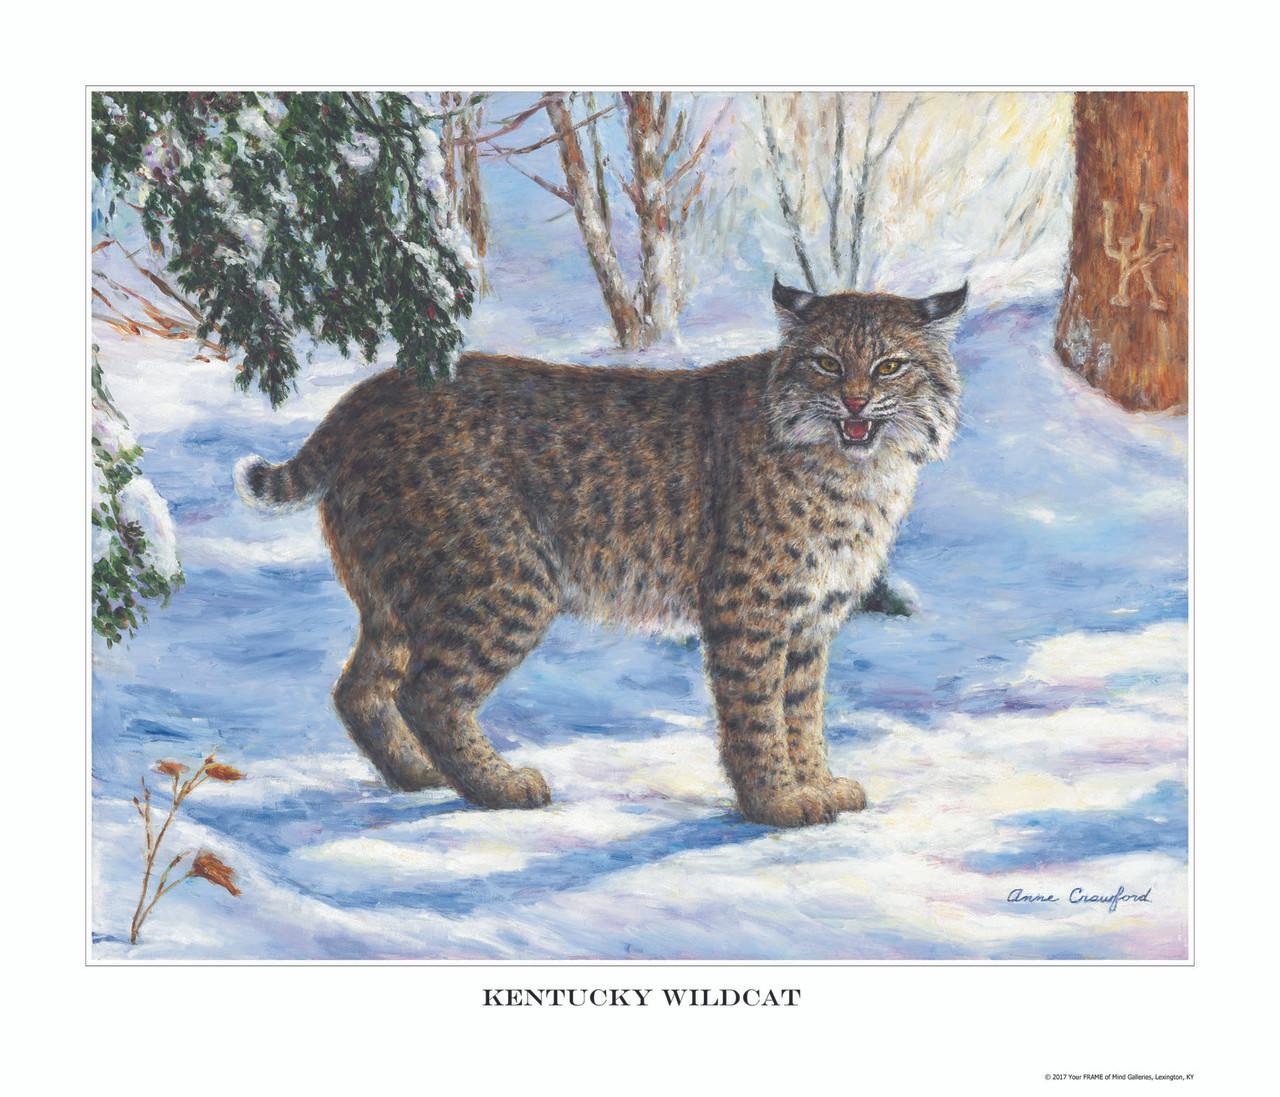 Kentucky Wildcat - Your Frame Of Mind Galleries